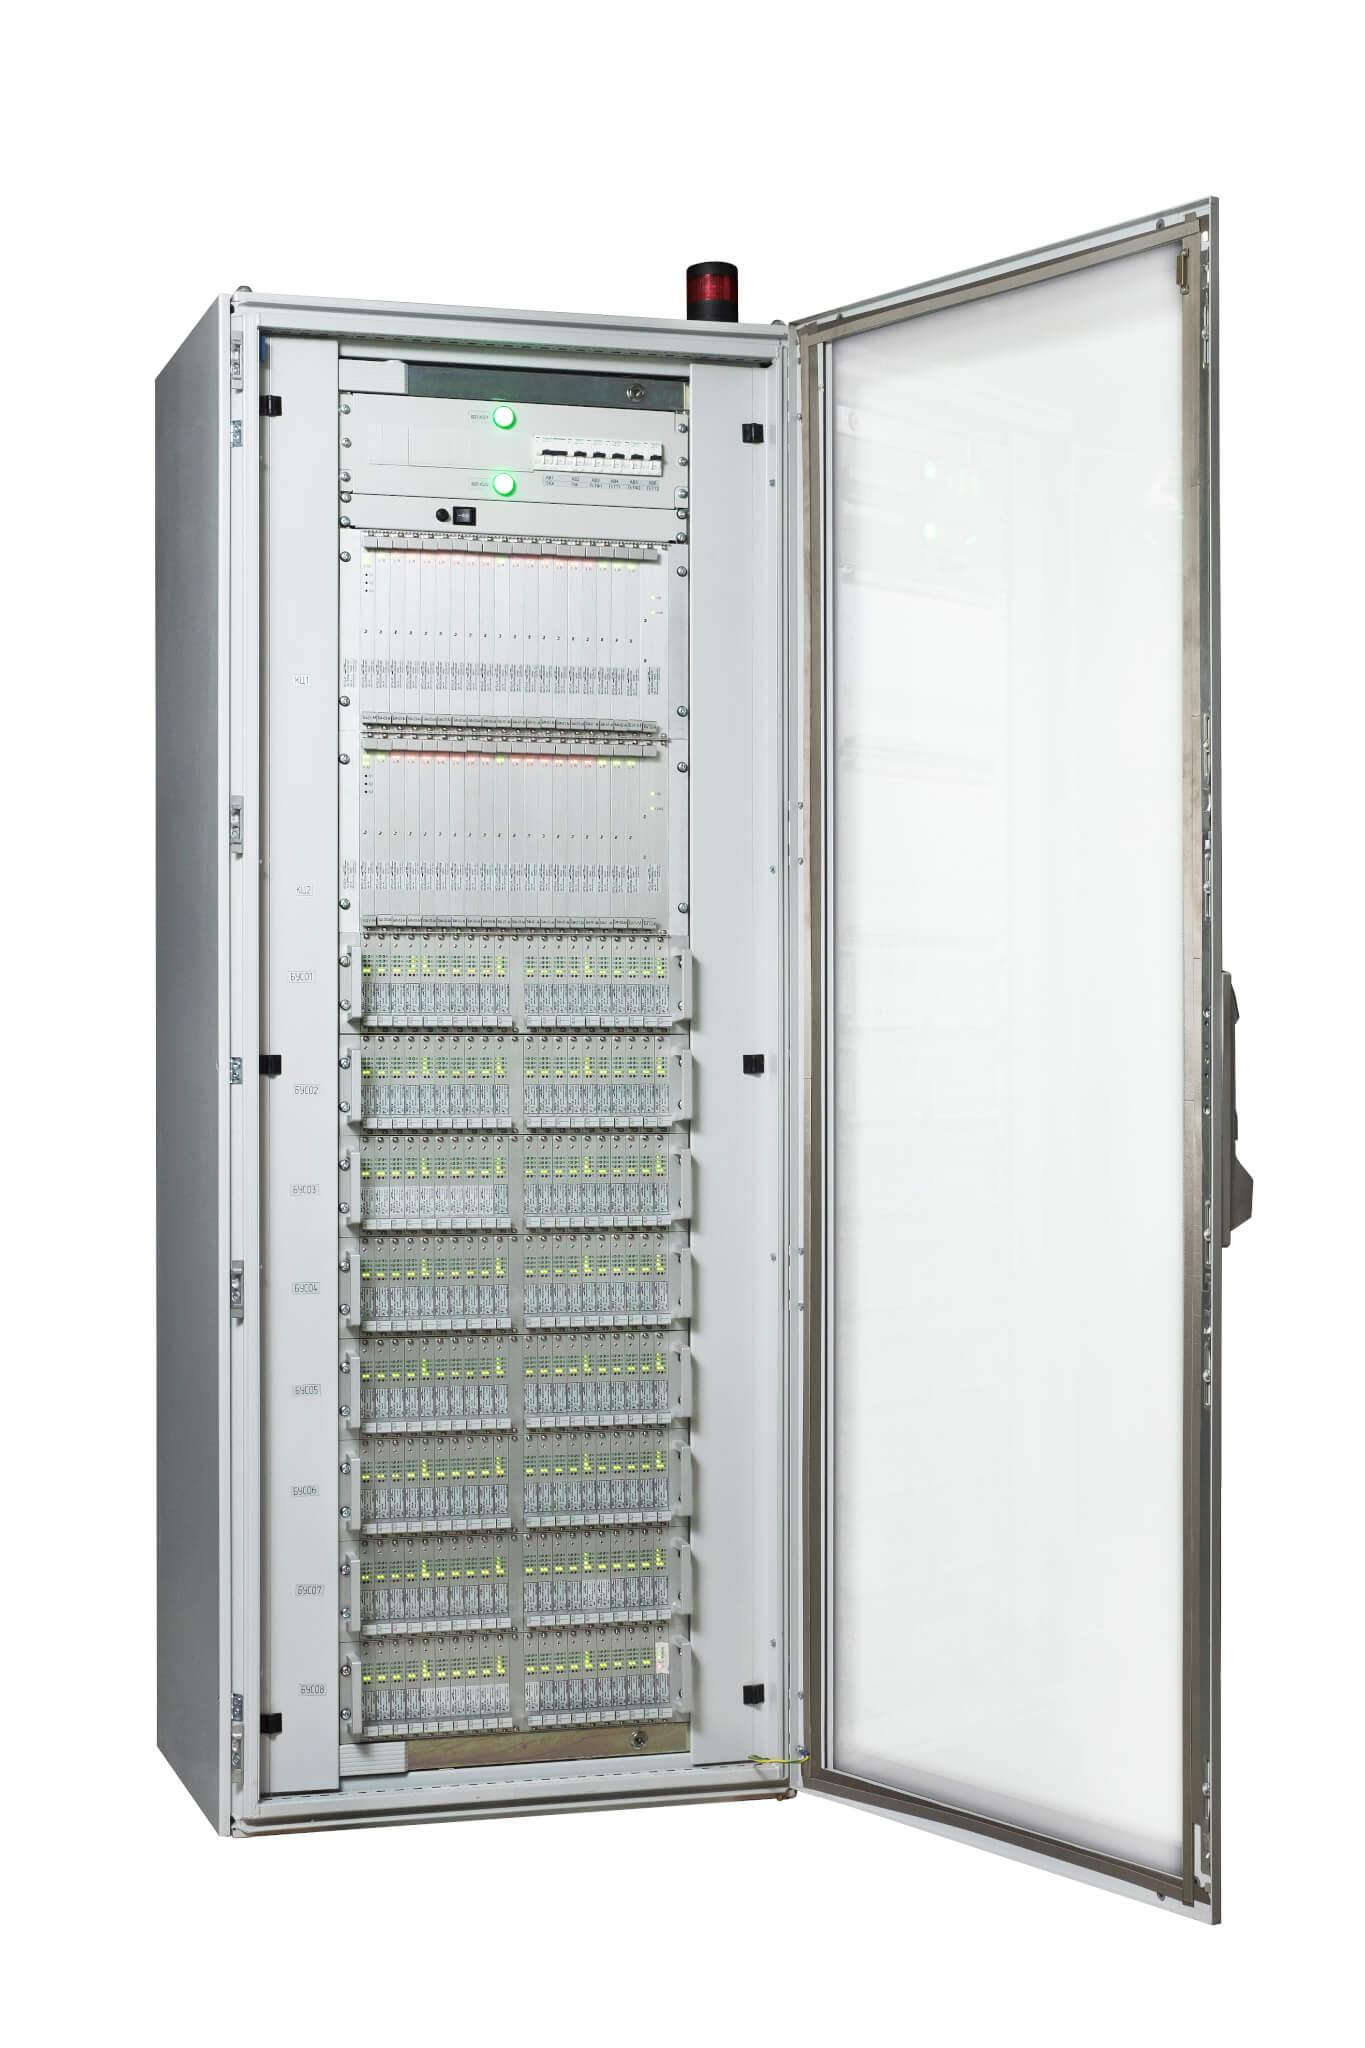 Main Interlocking Control Unit (MPC-I)